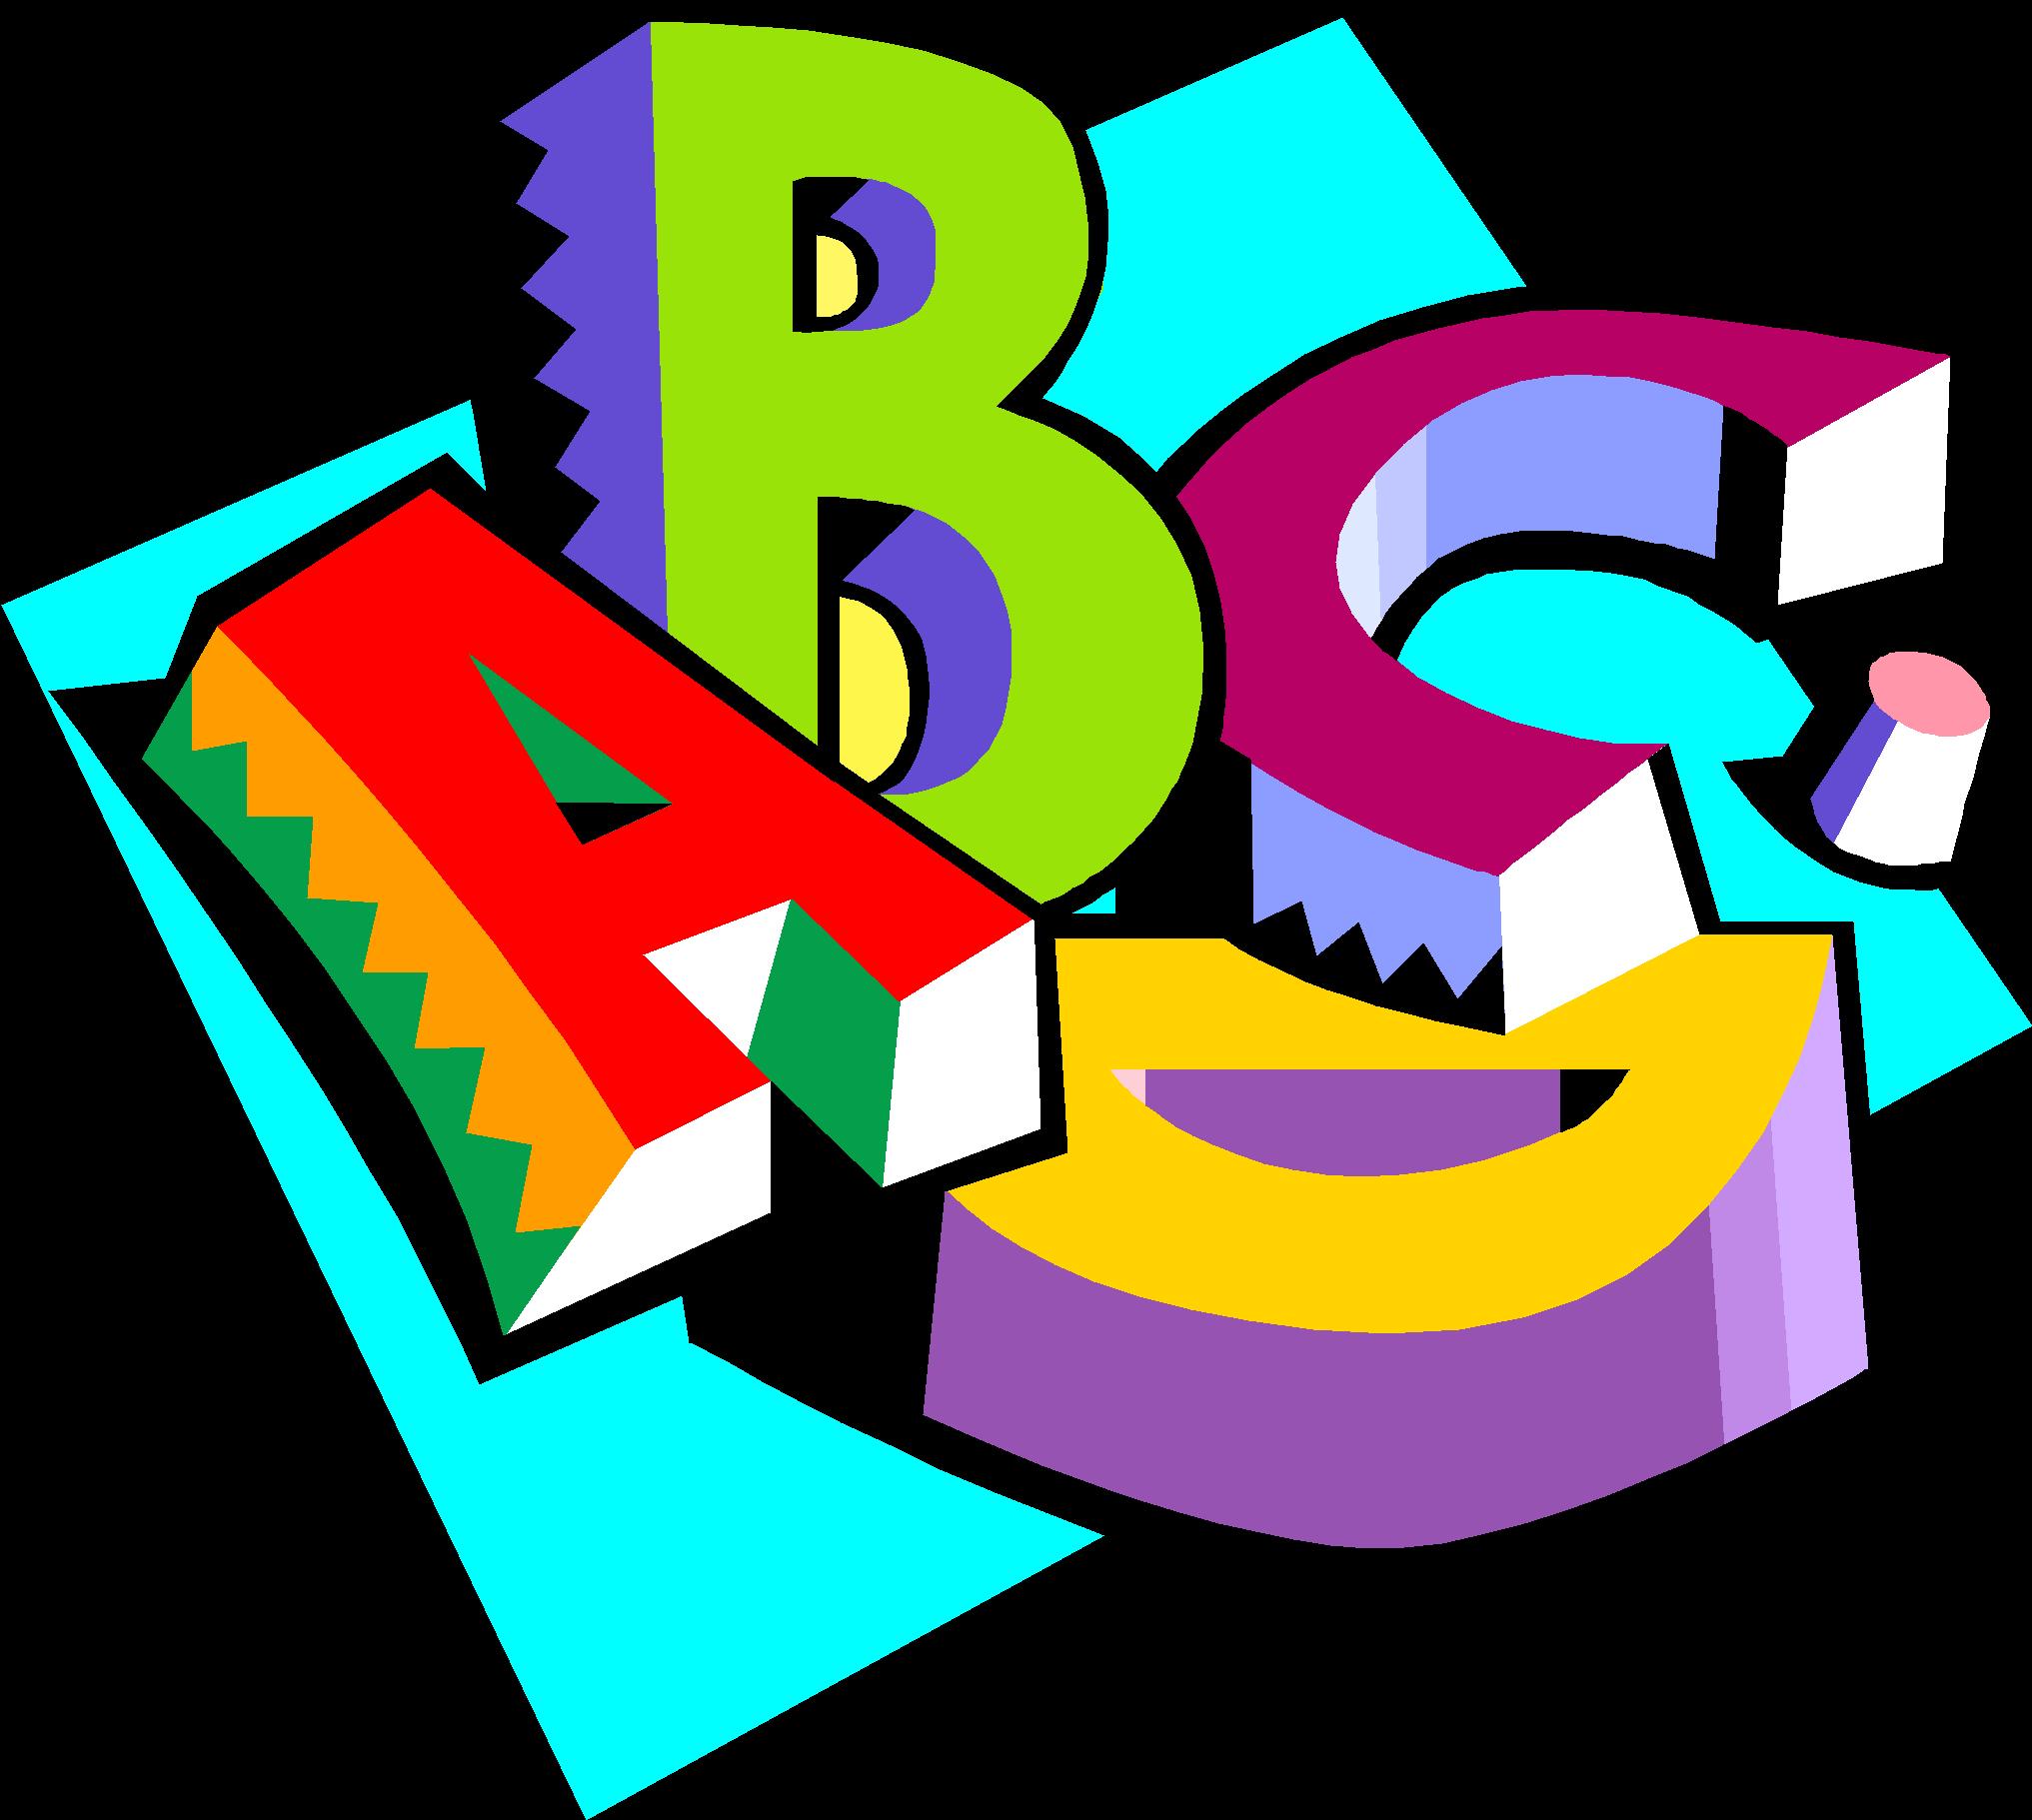 A B C D,,,,,,,,,,,,,,, Clipart.